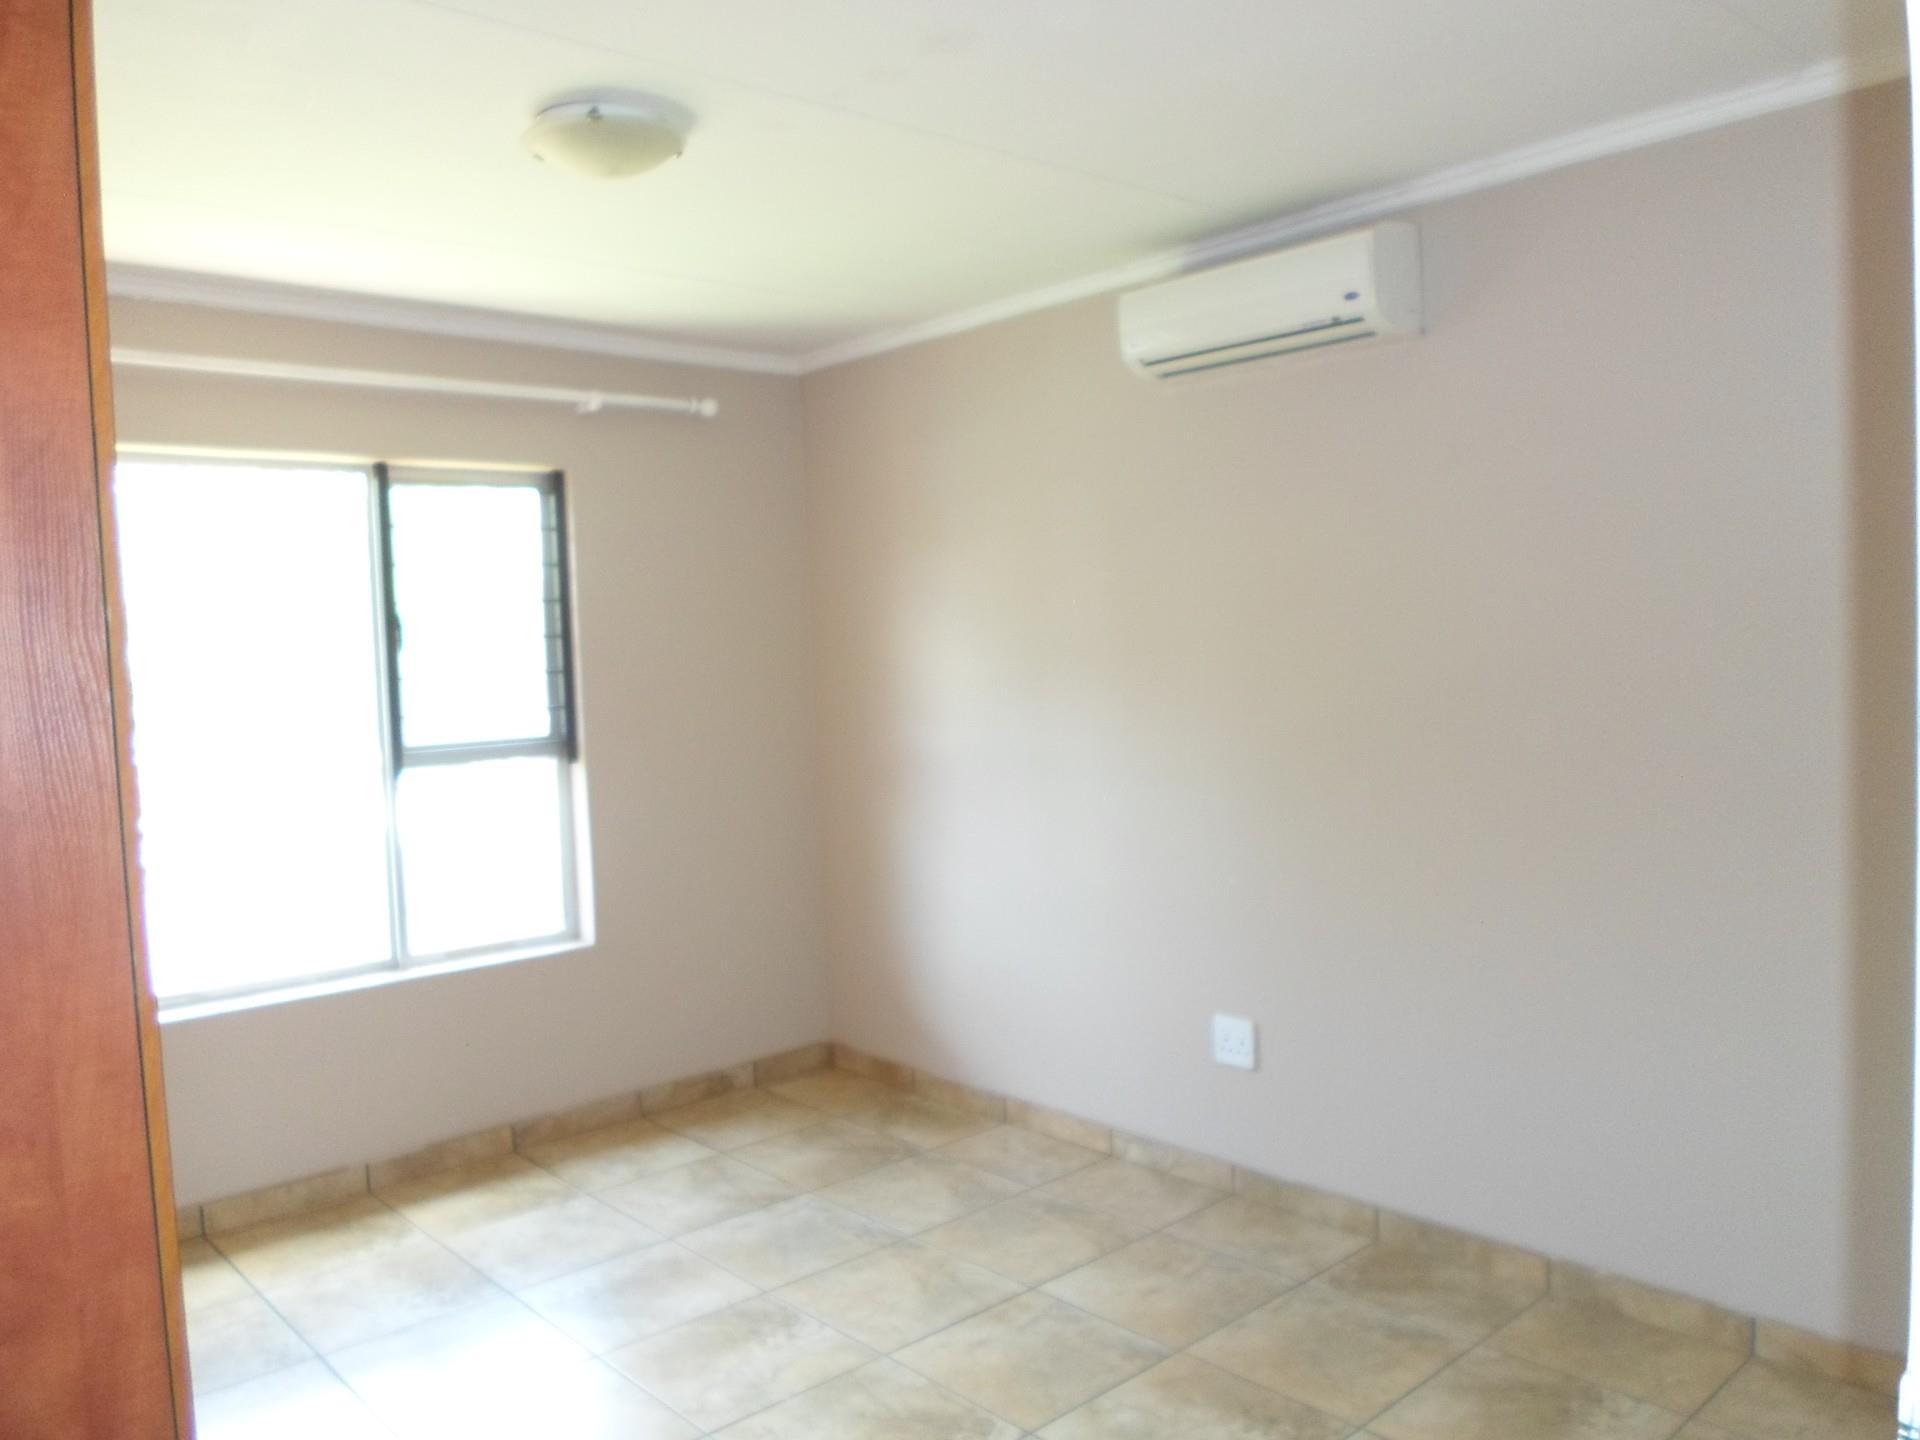 1 Bedroom House To Rent in Onverwacht